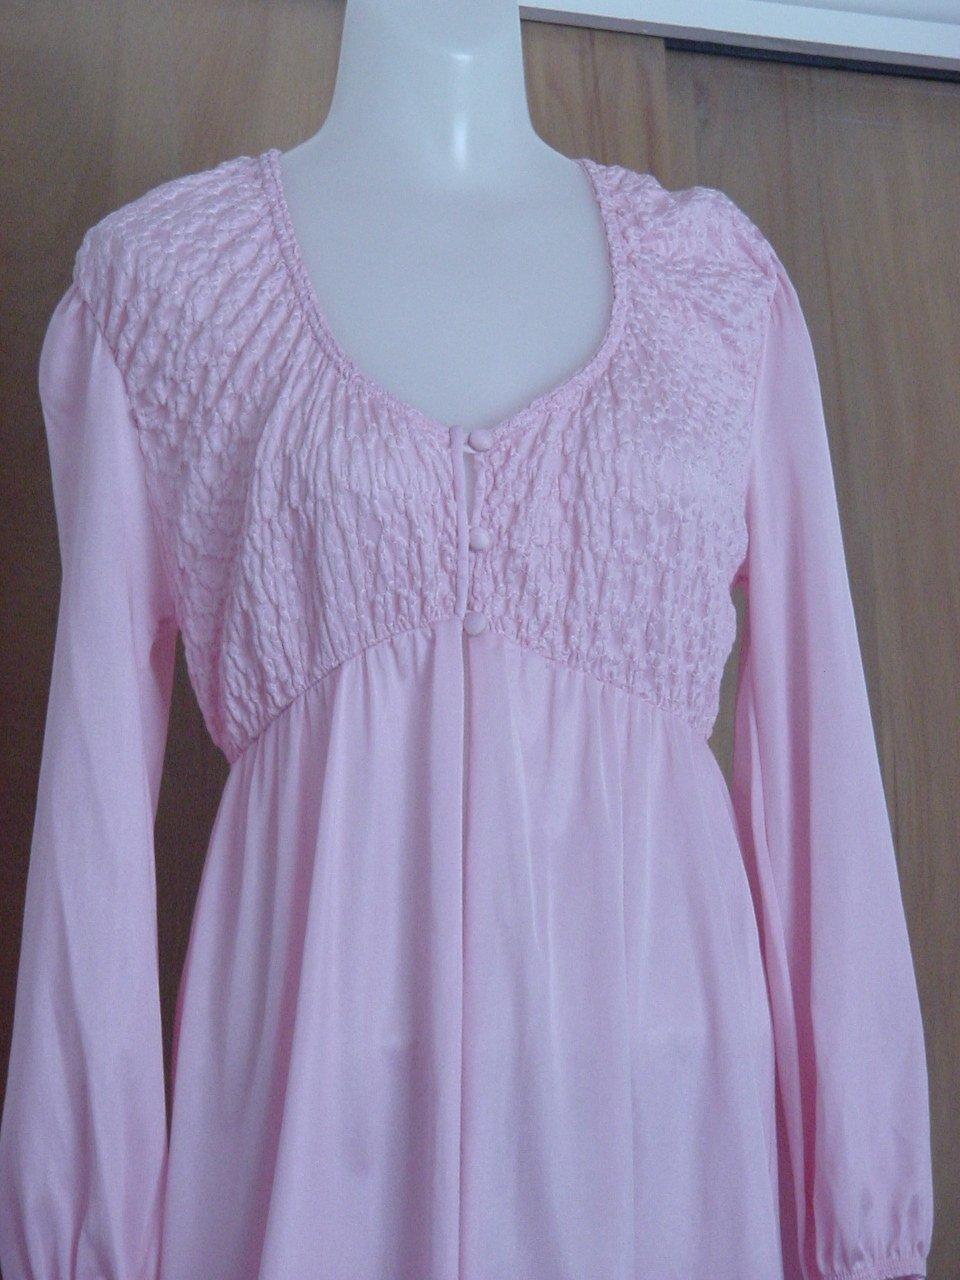 Kayser robe Pink Medium size nightwear   No. 227